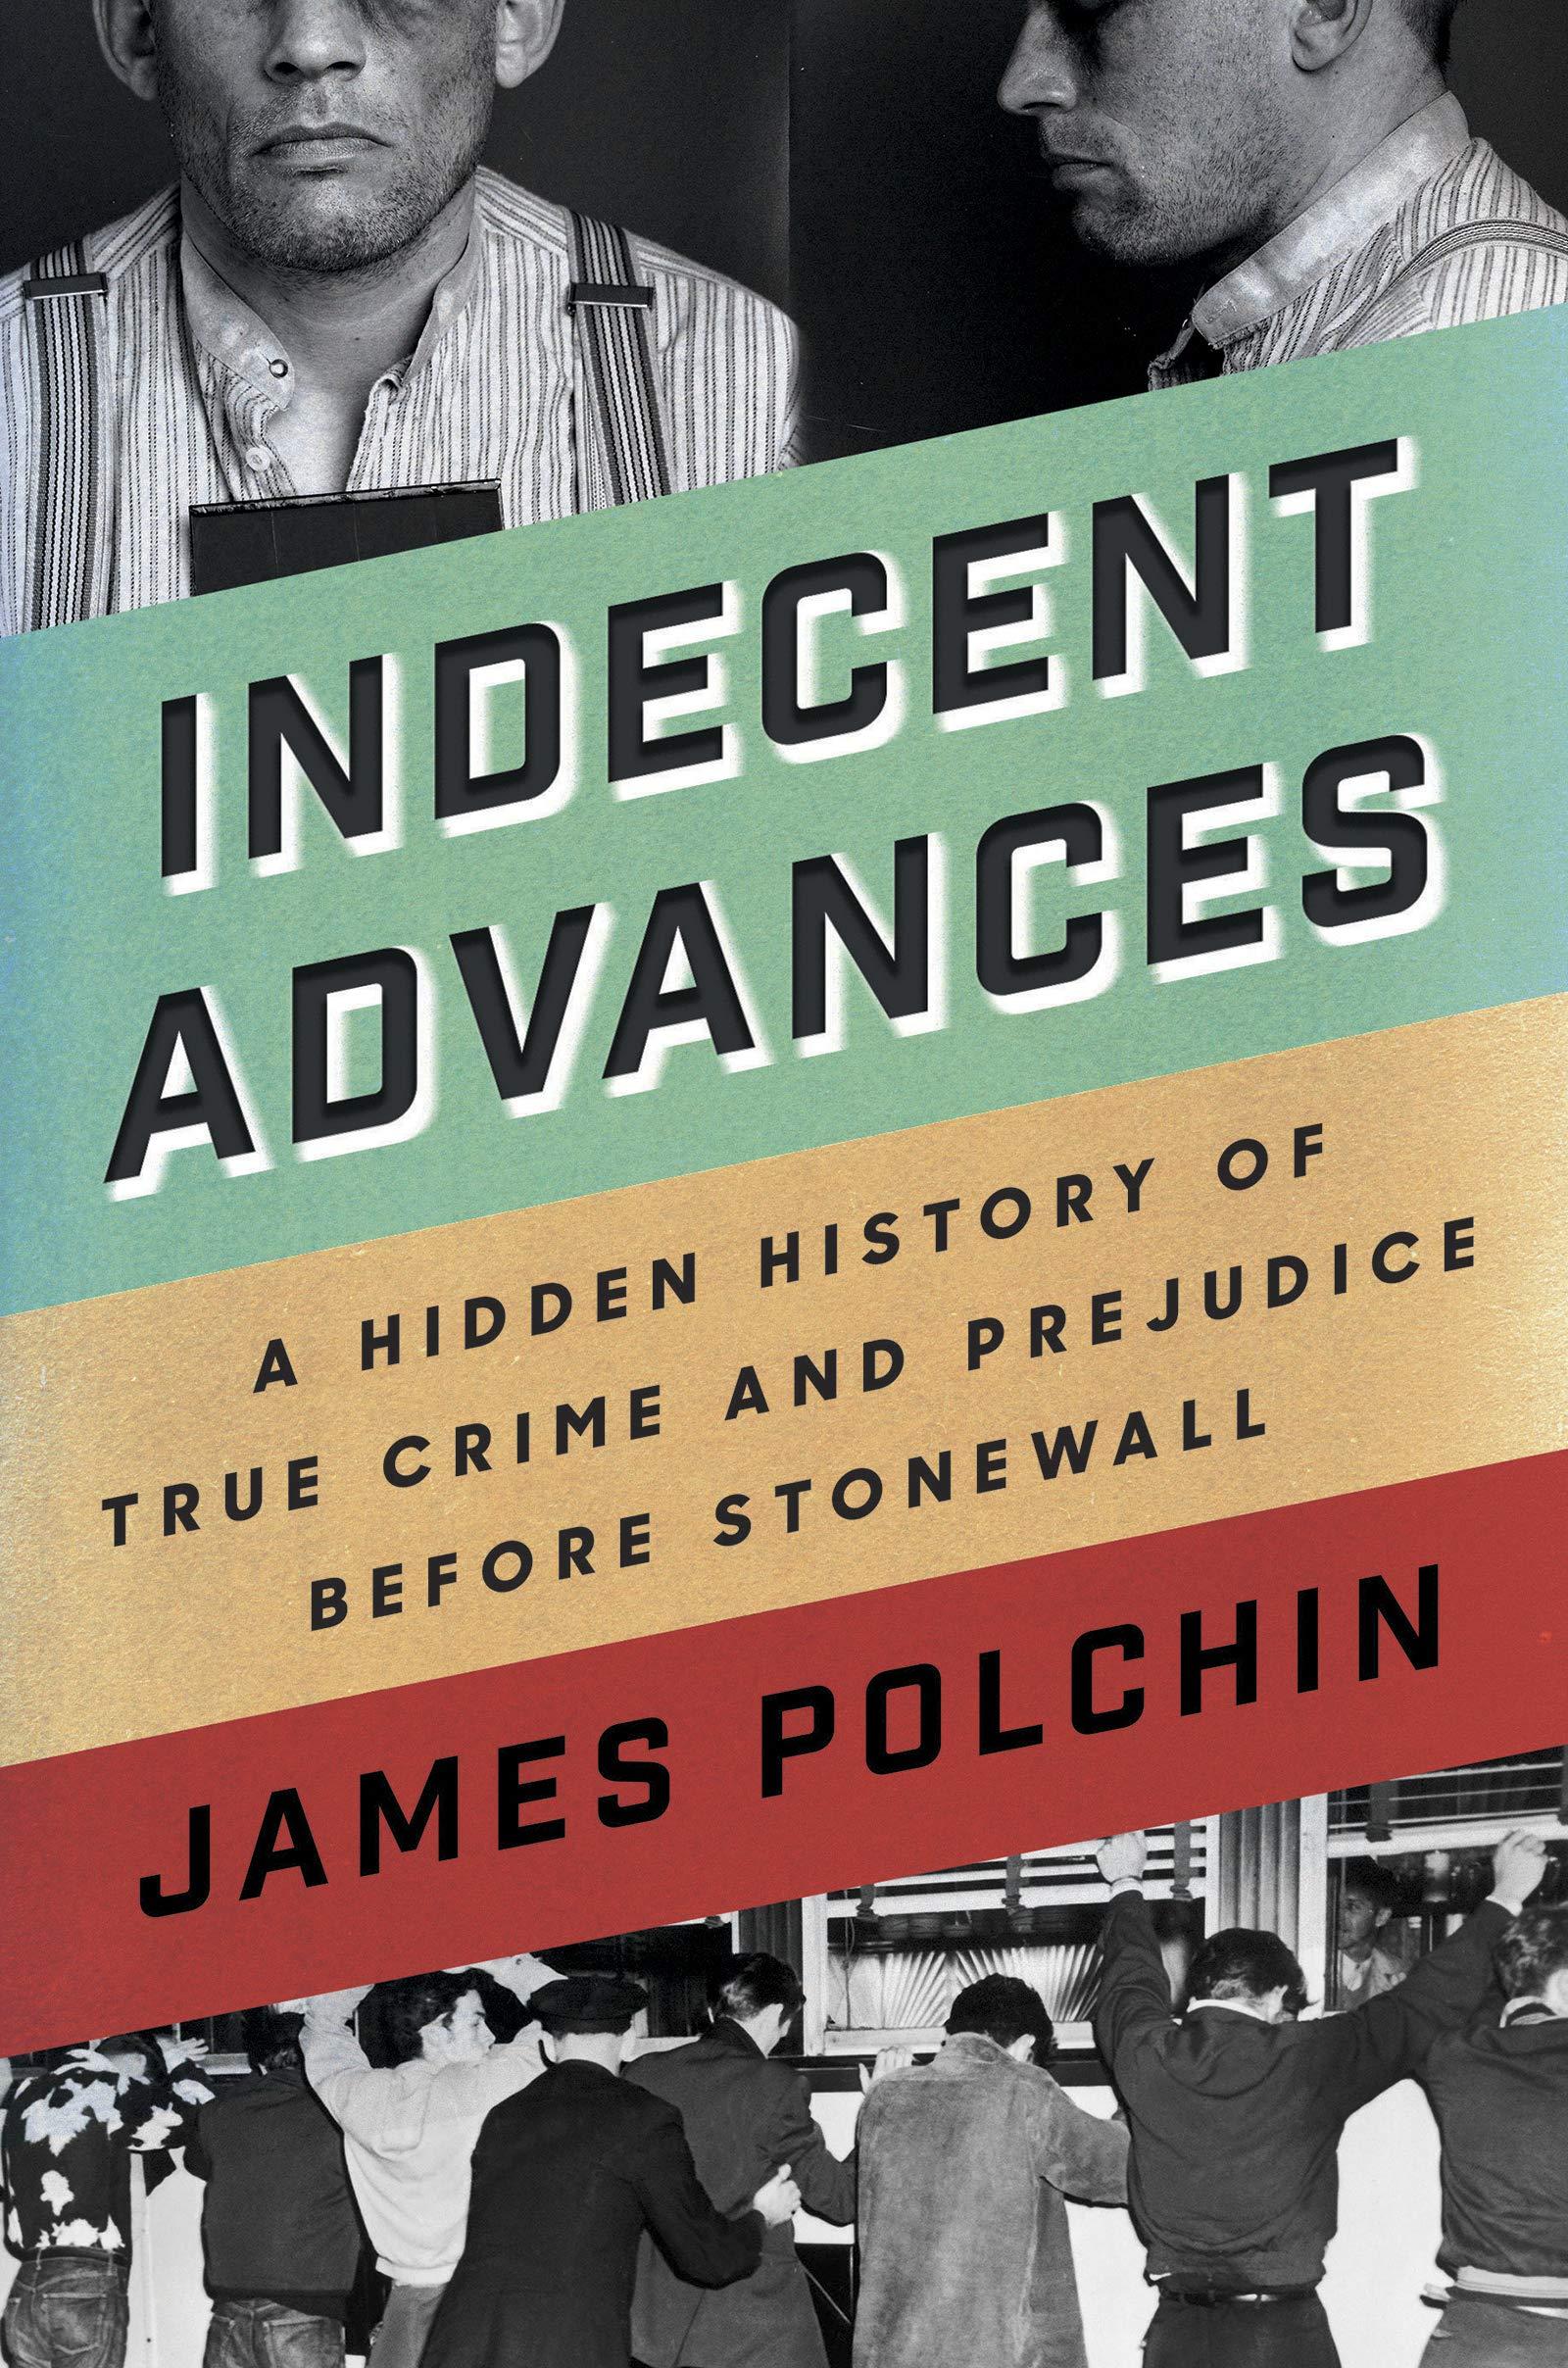 Indecent Advances: A Hidden History of True Crime and